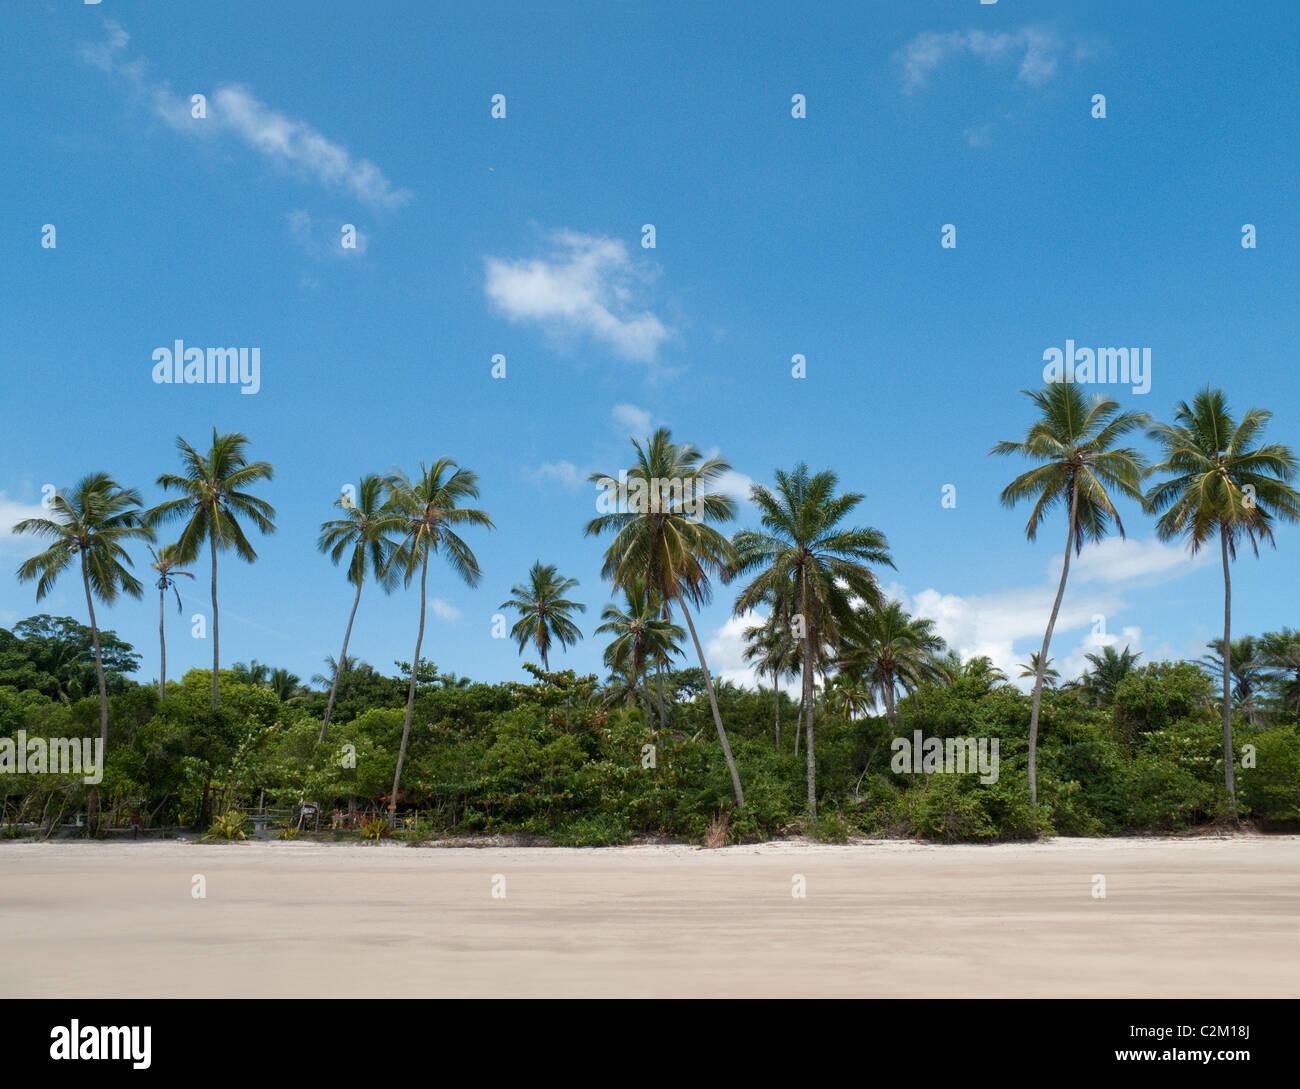 Palme sulla spiaggia, isola di Boipeba, Bahia, Brasile Foto Stock